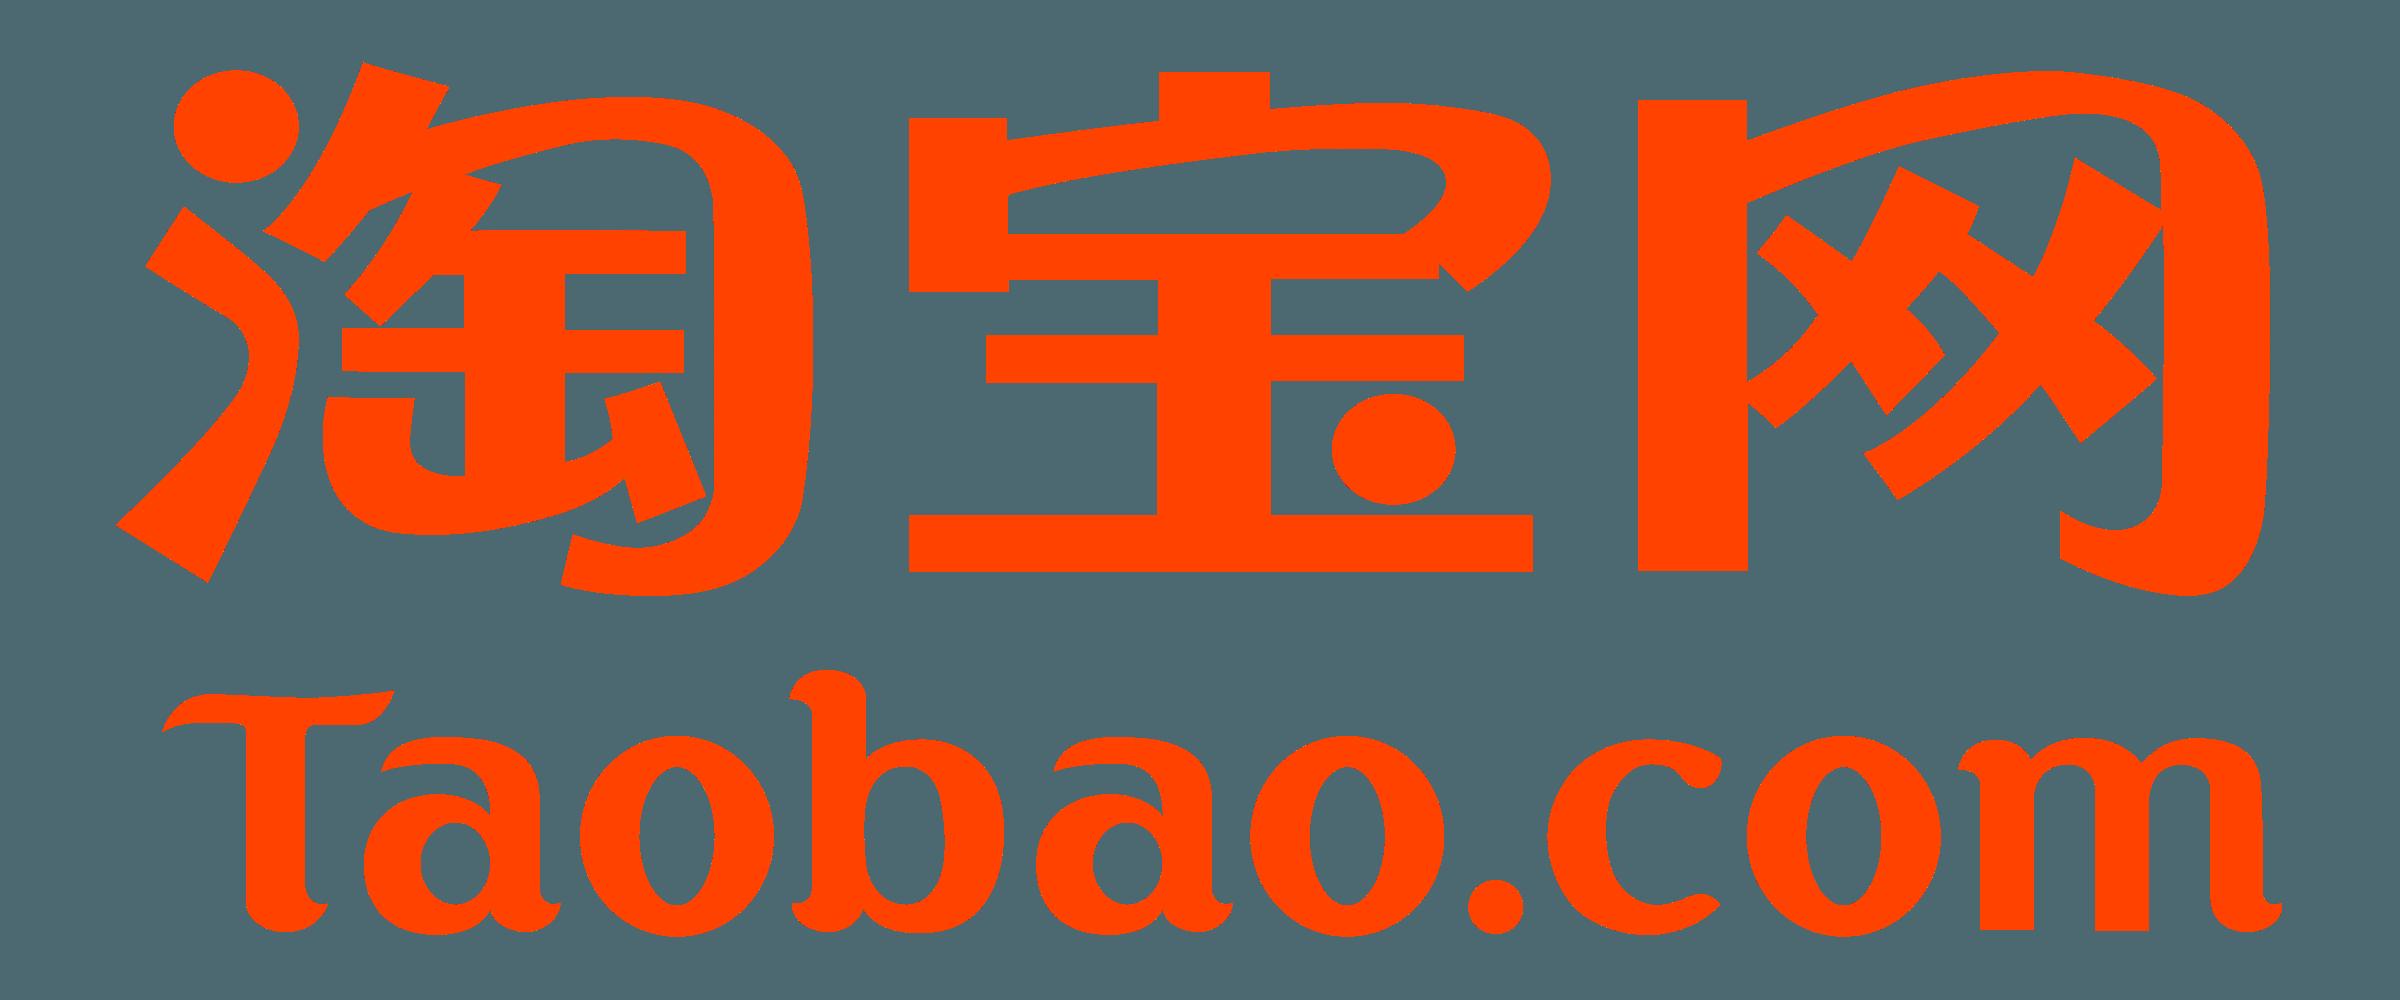 05-Taobao-logo